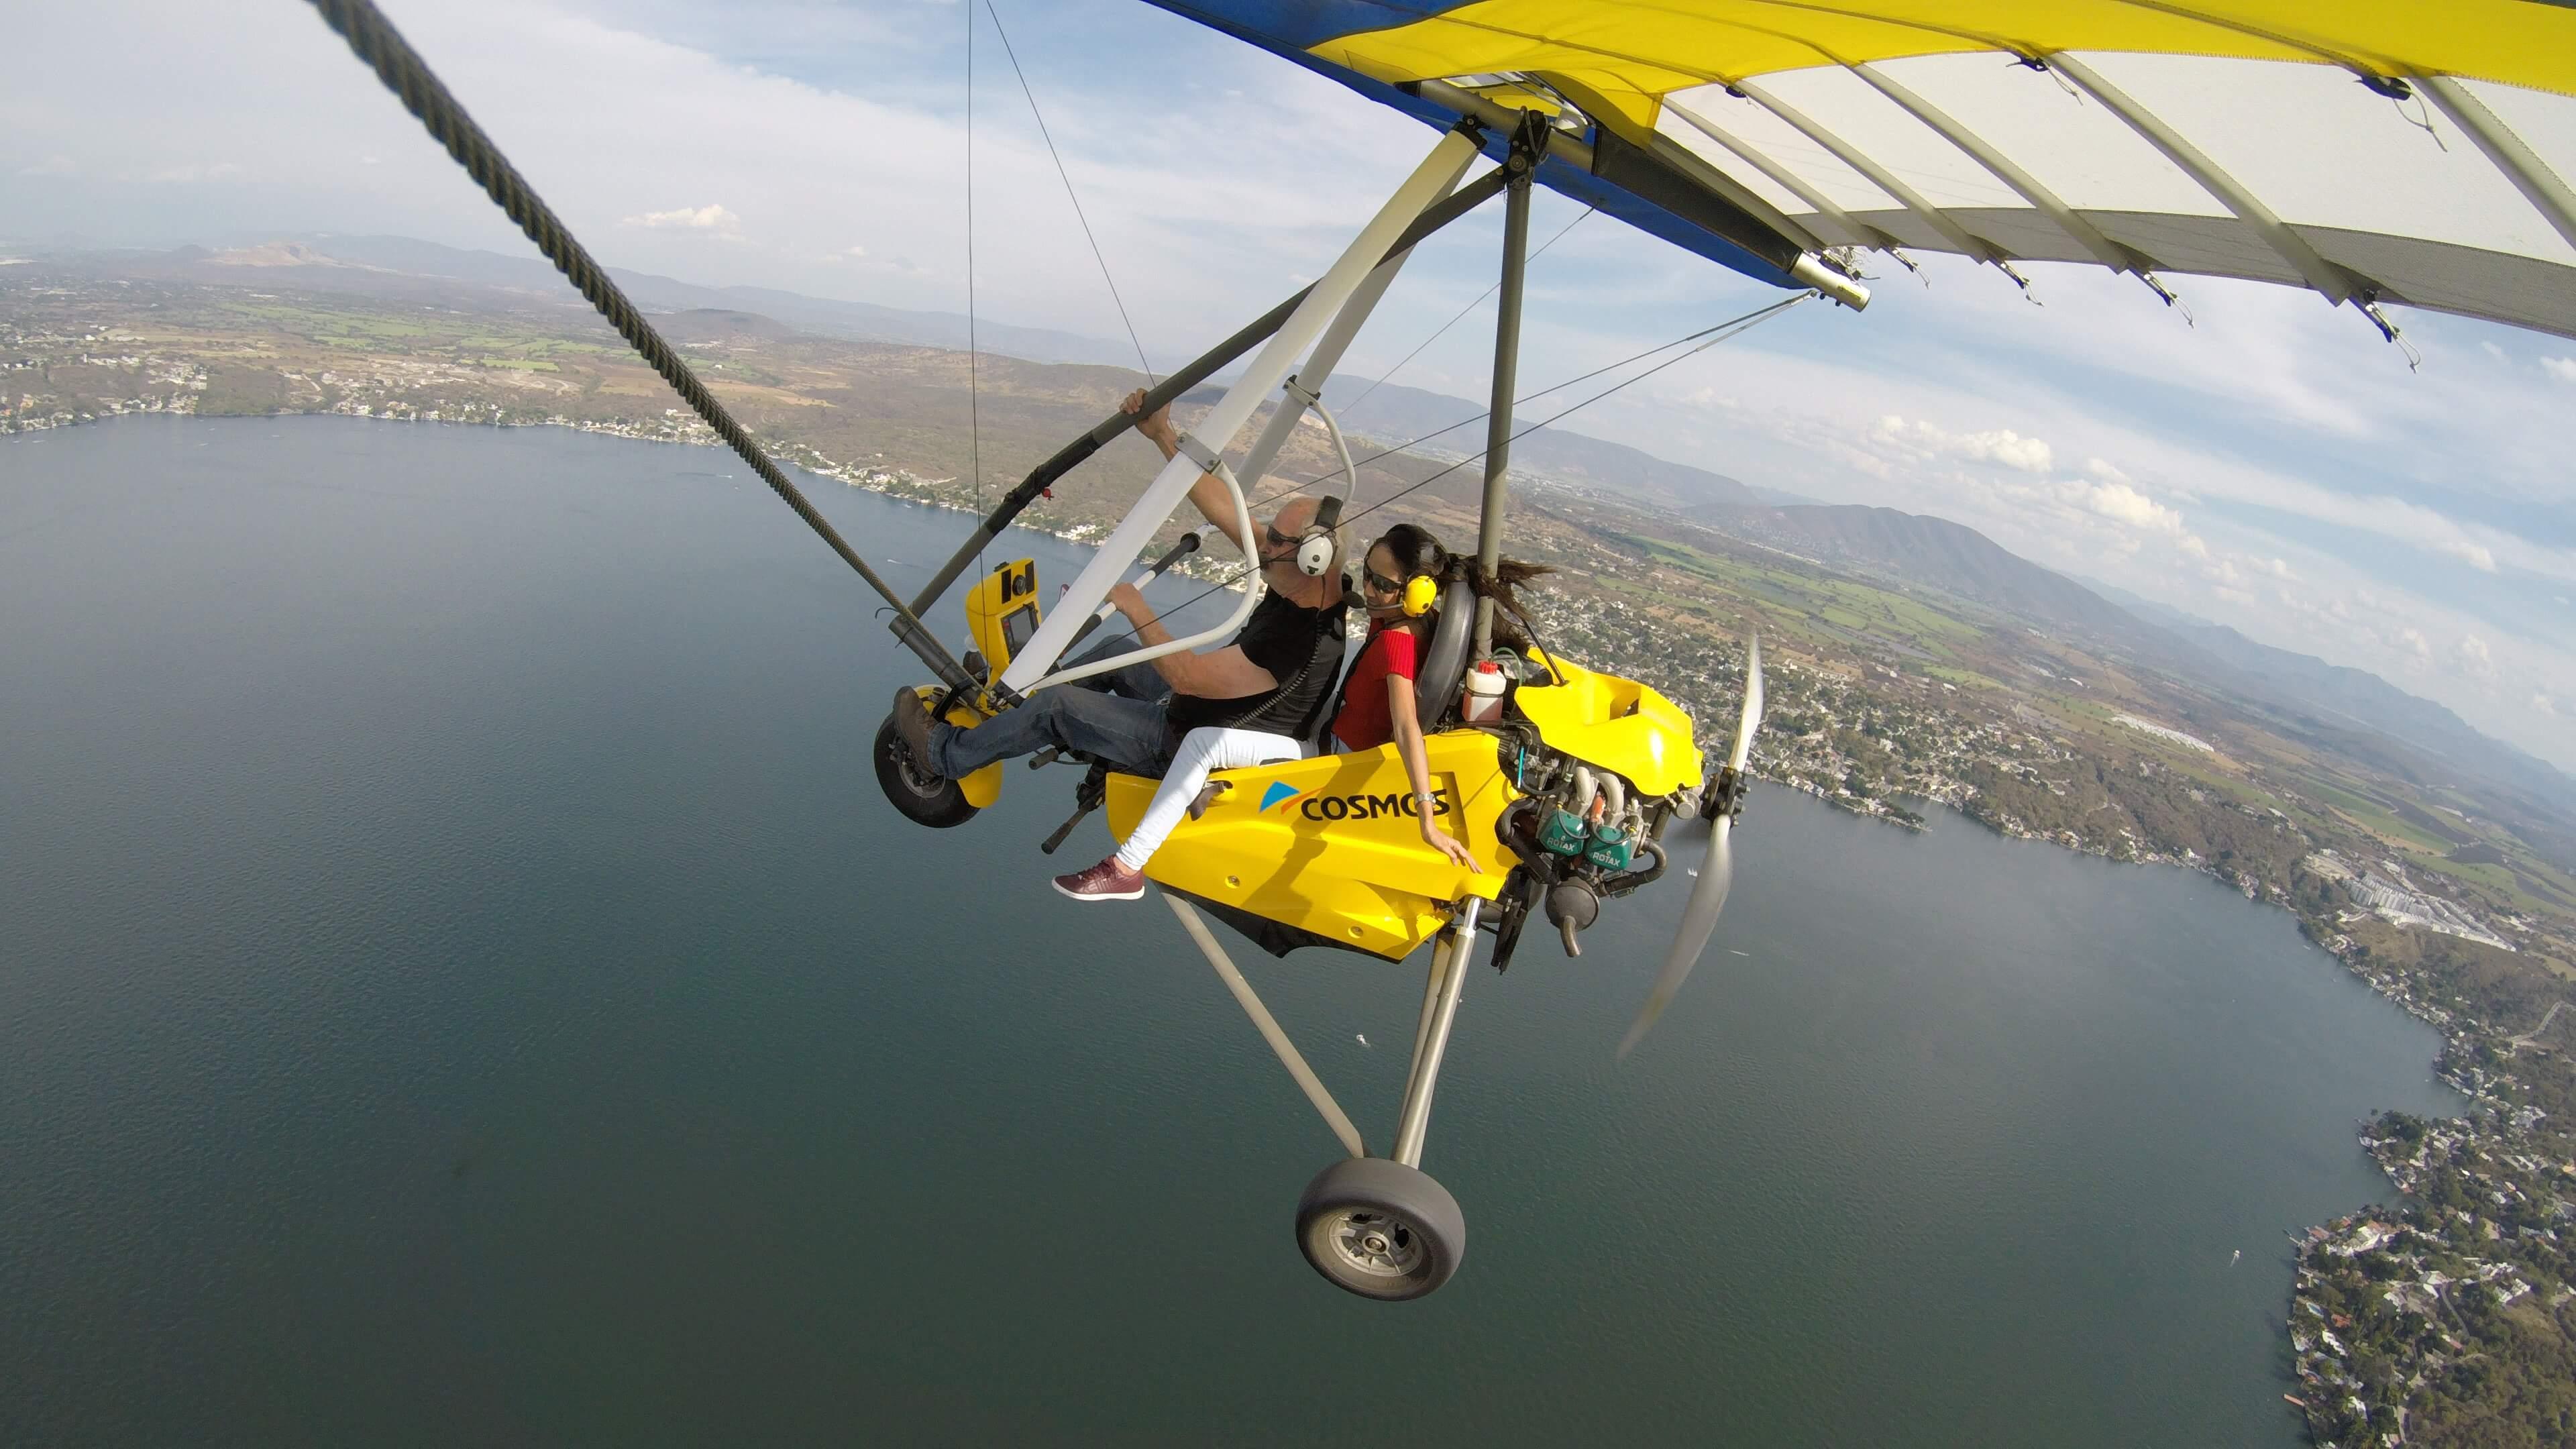 Visitantes sobrevolando el lago de Tequesquitengo